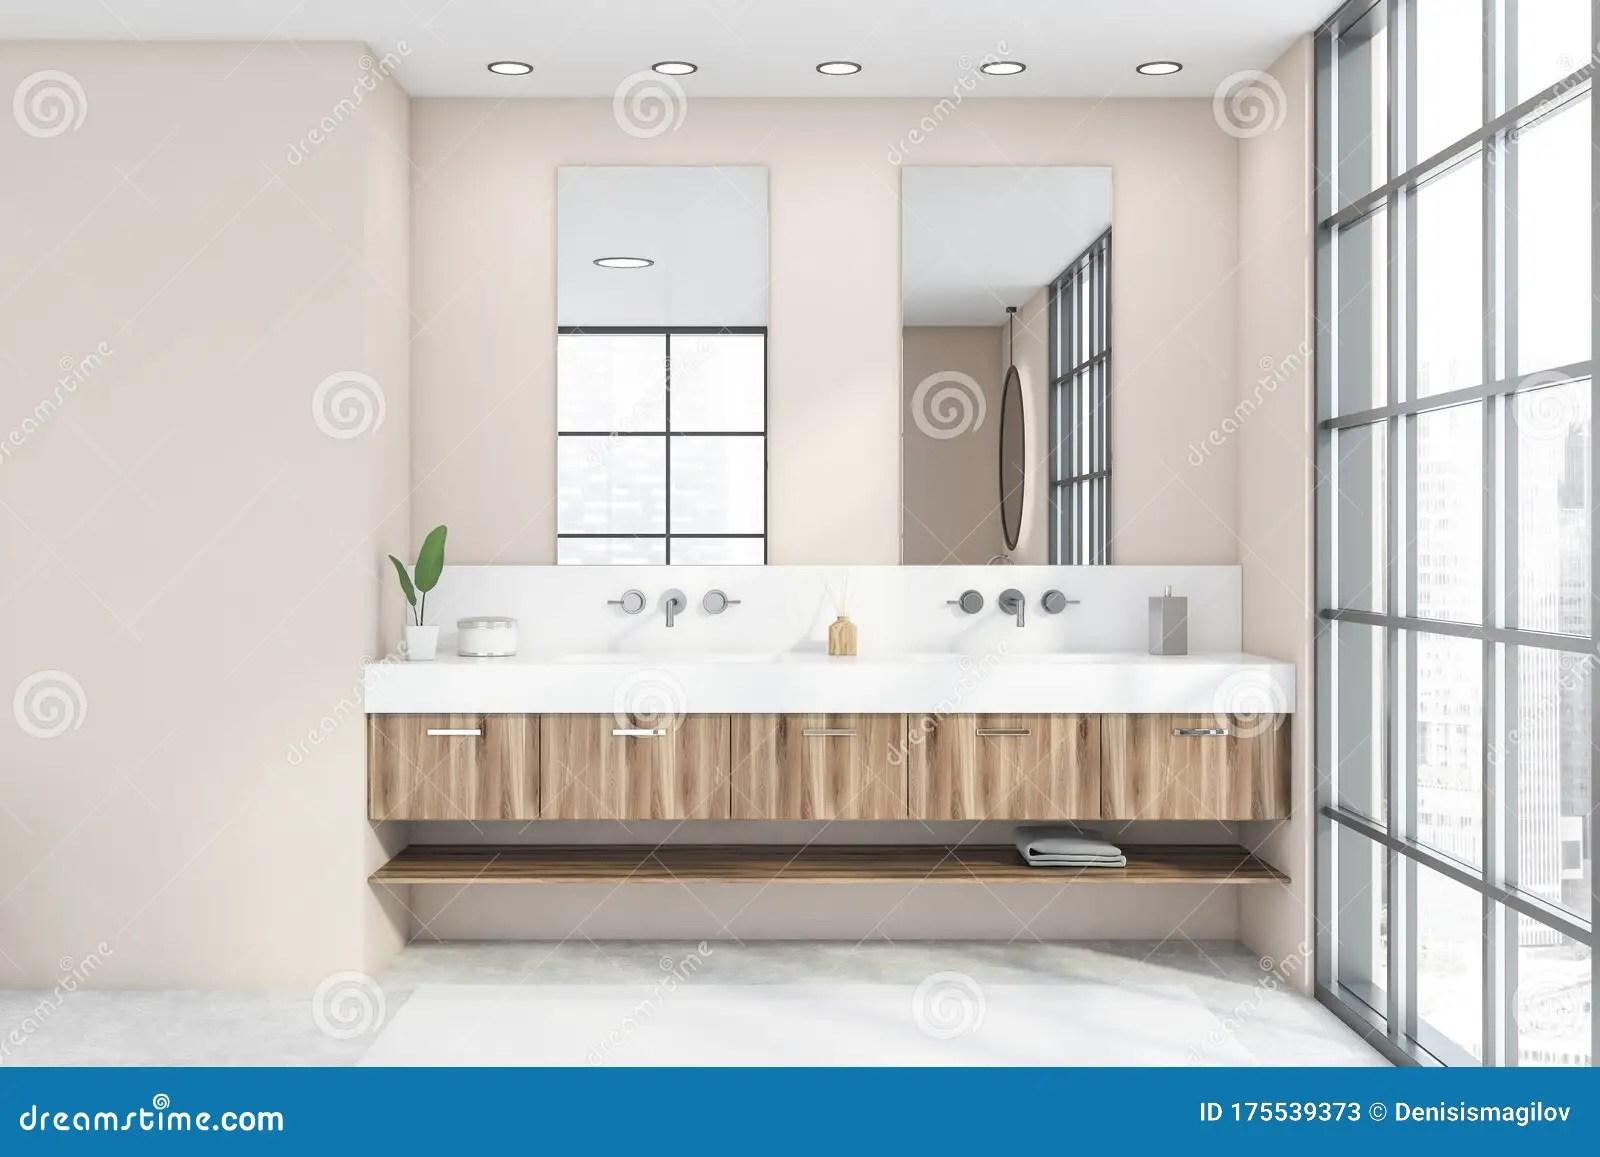 double sink in panoramic beige bathroom stock illustration illustration of apartment elegance 175539373